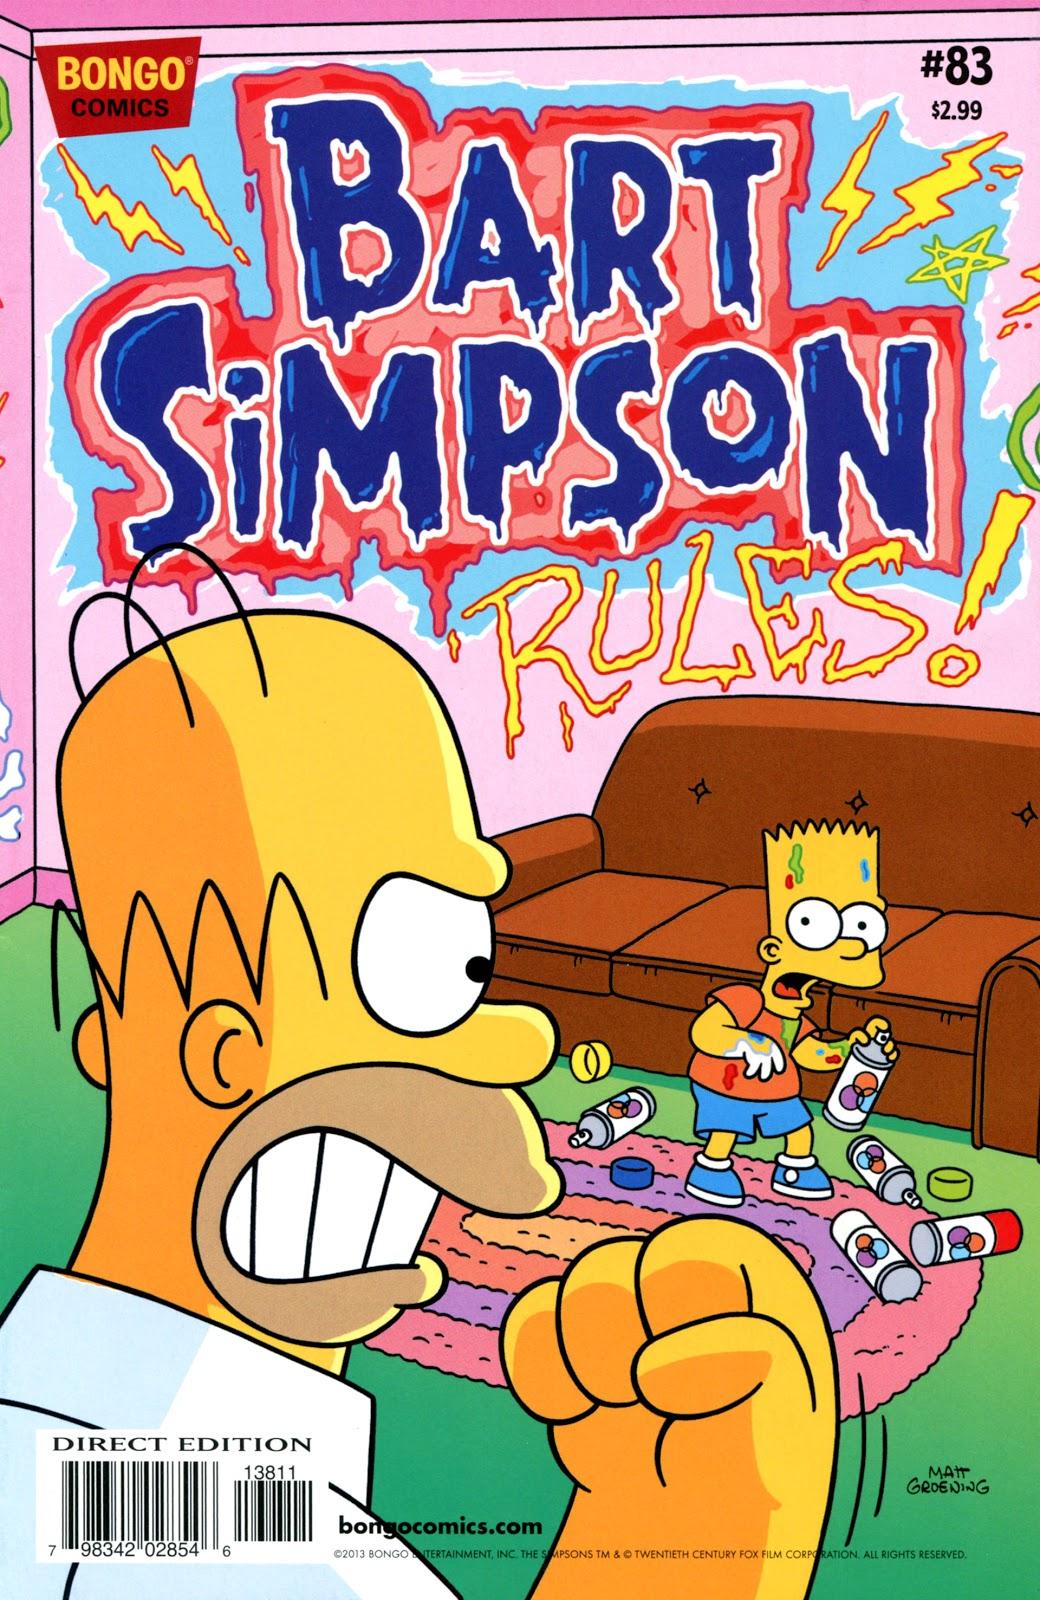 Simpsons Comics Presents Bart Simpson 83 Page 1